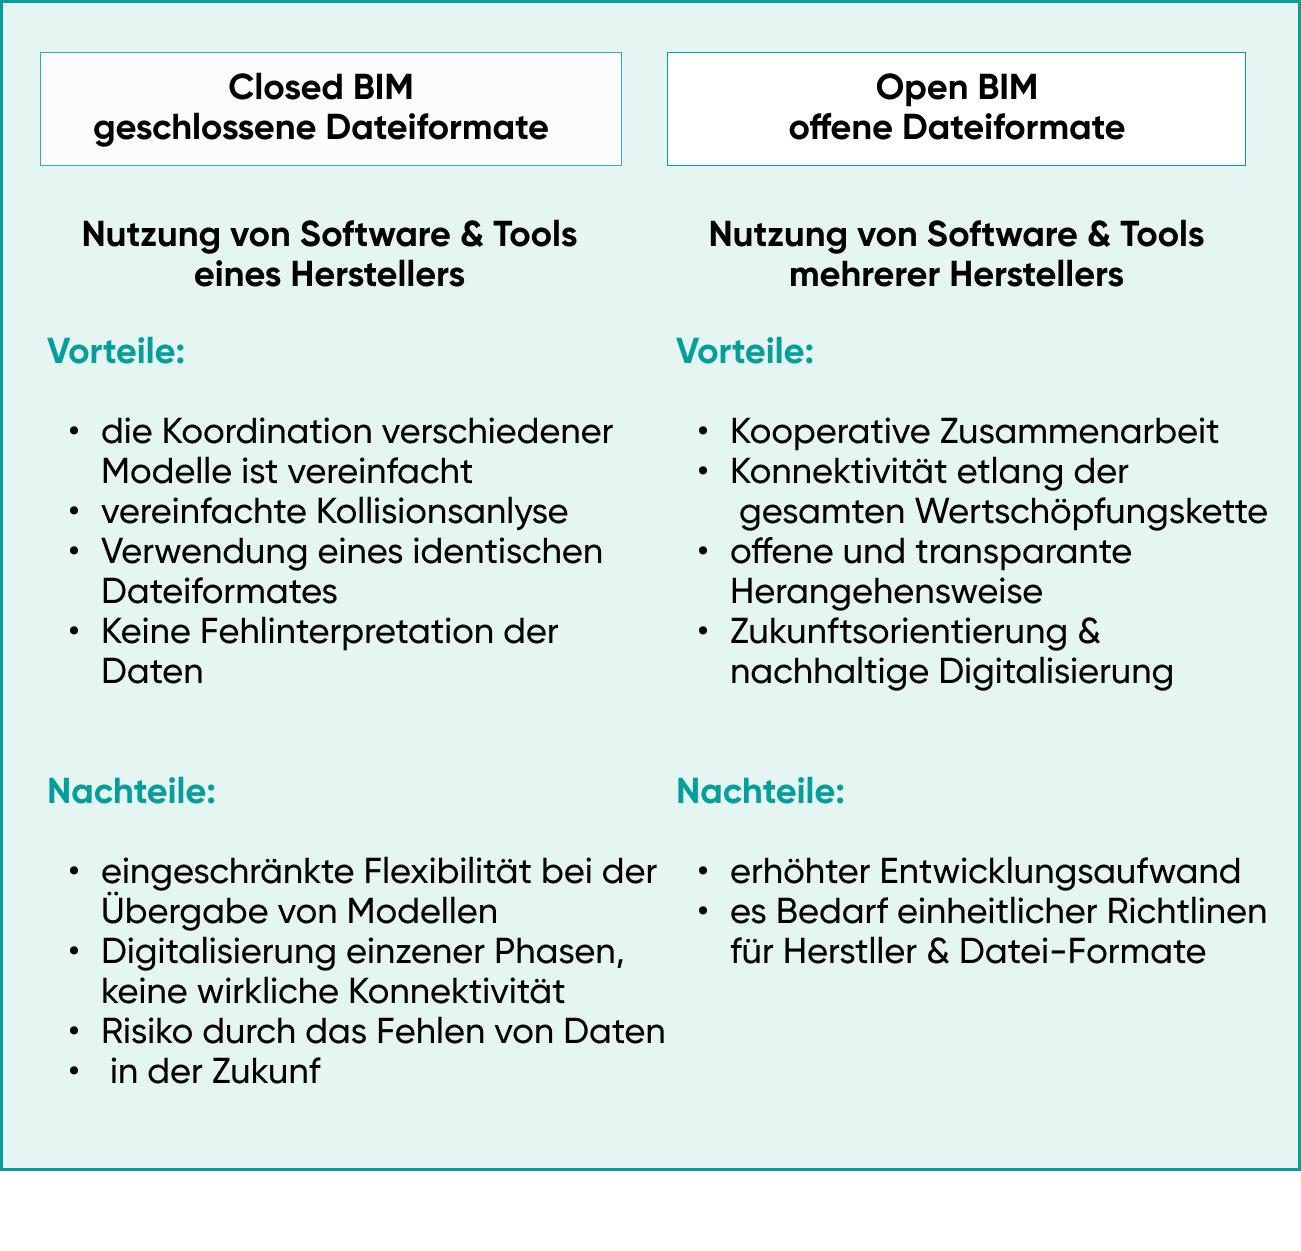 Open BIM vs. Closed BIM